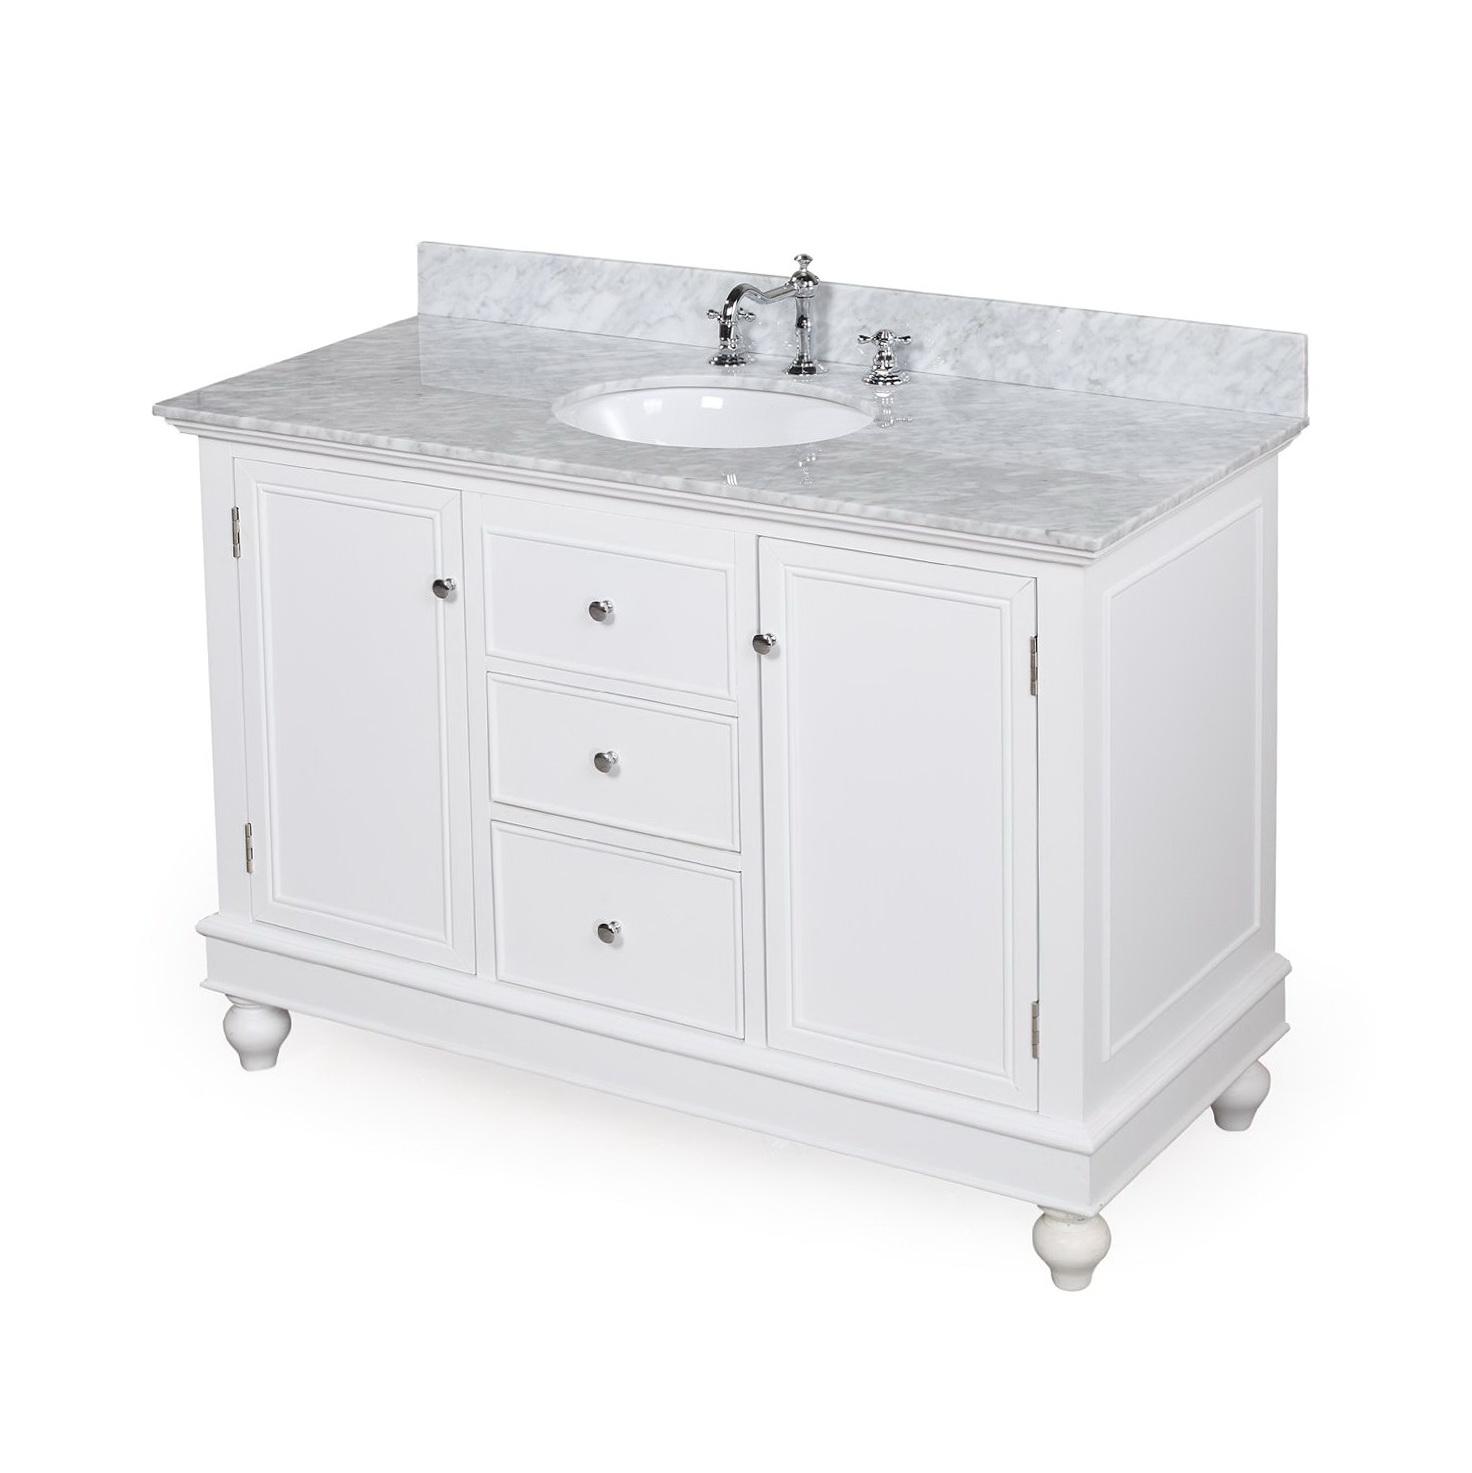 100 36 Bathroom Vanity With Top Bathrooms Design Inch Bathr Autumn Sale 72 Inch Vanity 36 Inch